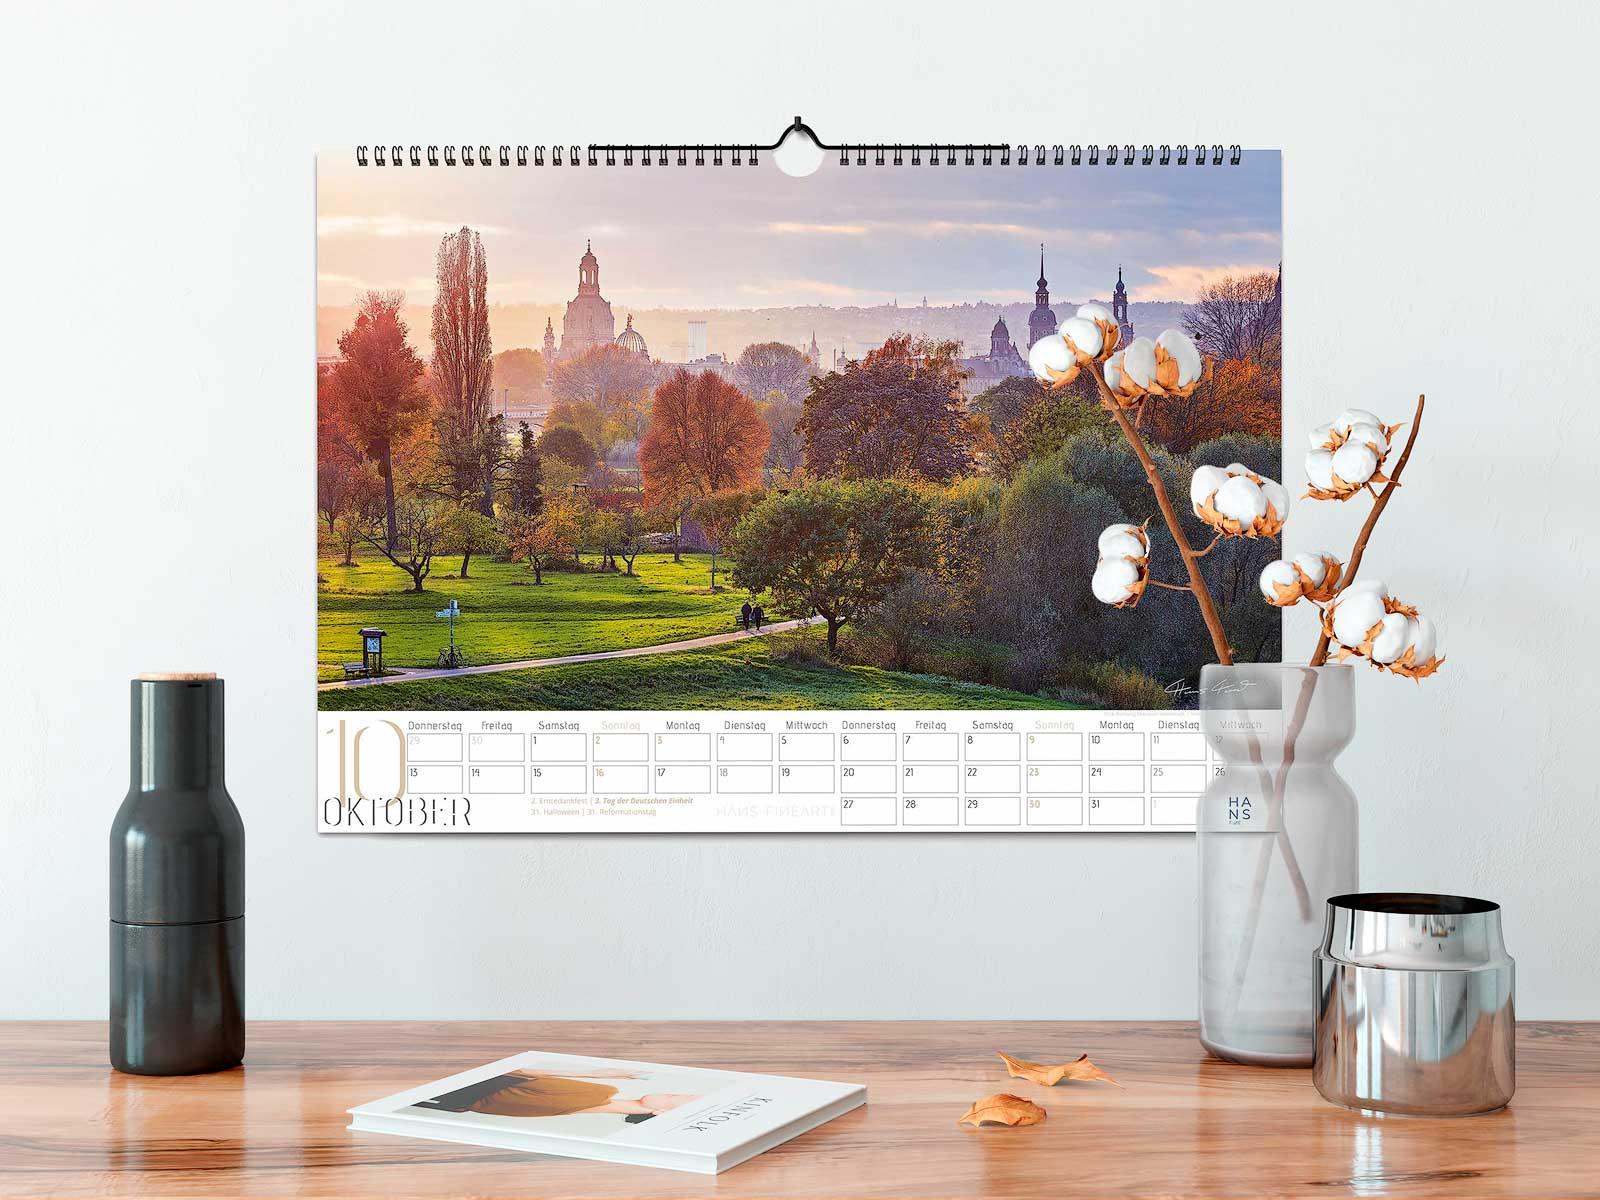 Kalender 2022 Hans Fineart